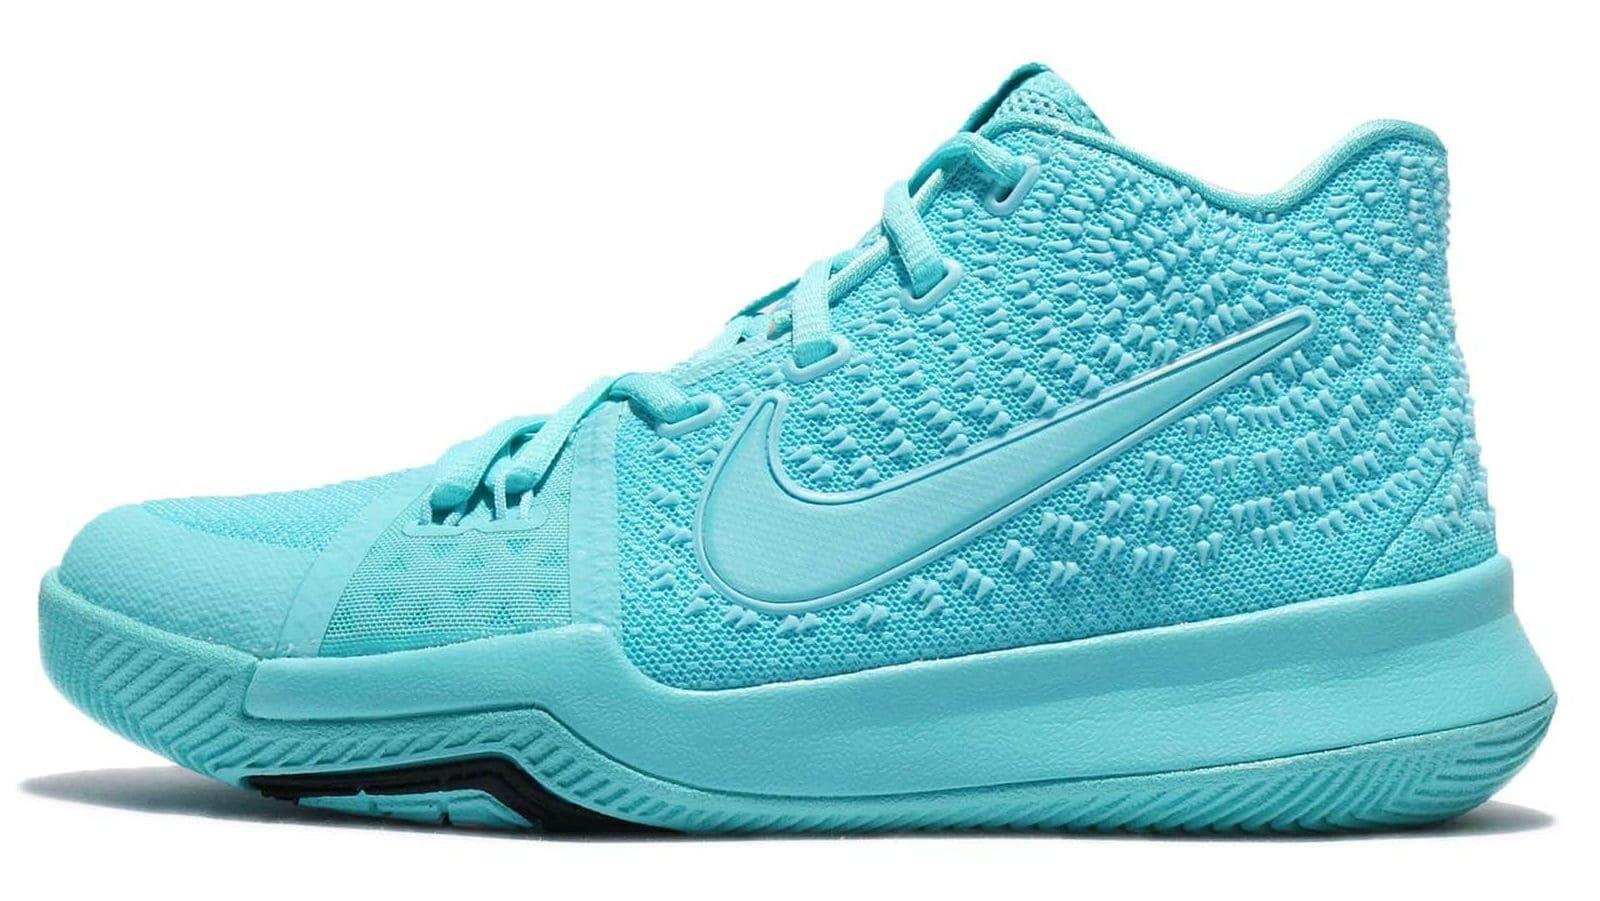 best website 1e6db 0fb2e Nike Kyrie 3 GS Aqua Release Date Profile 859466-401